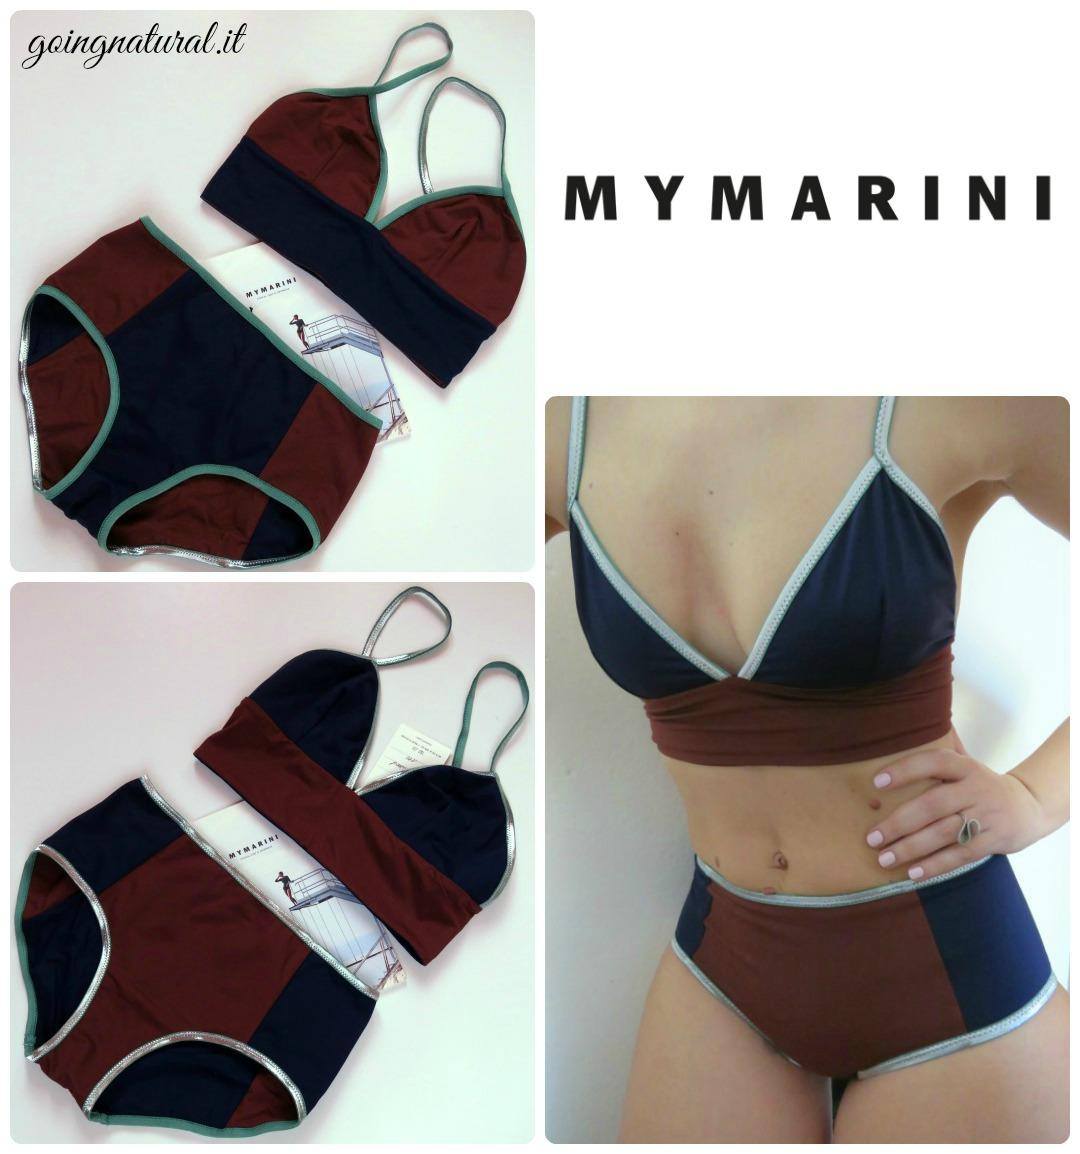 mymarini costumi ecologici bikini